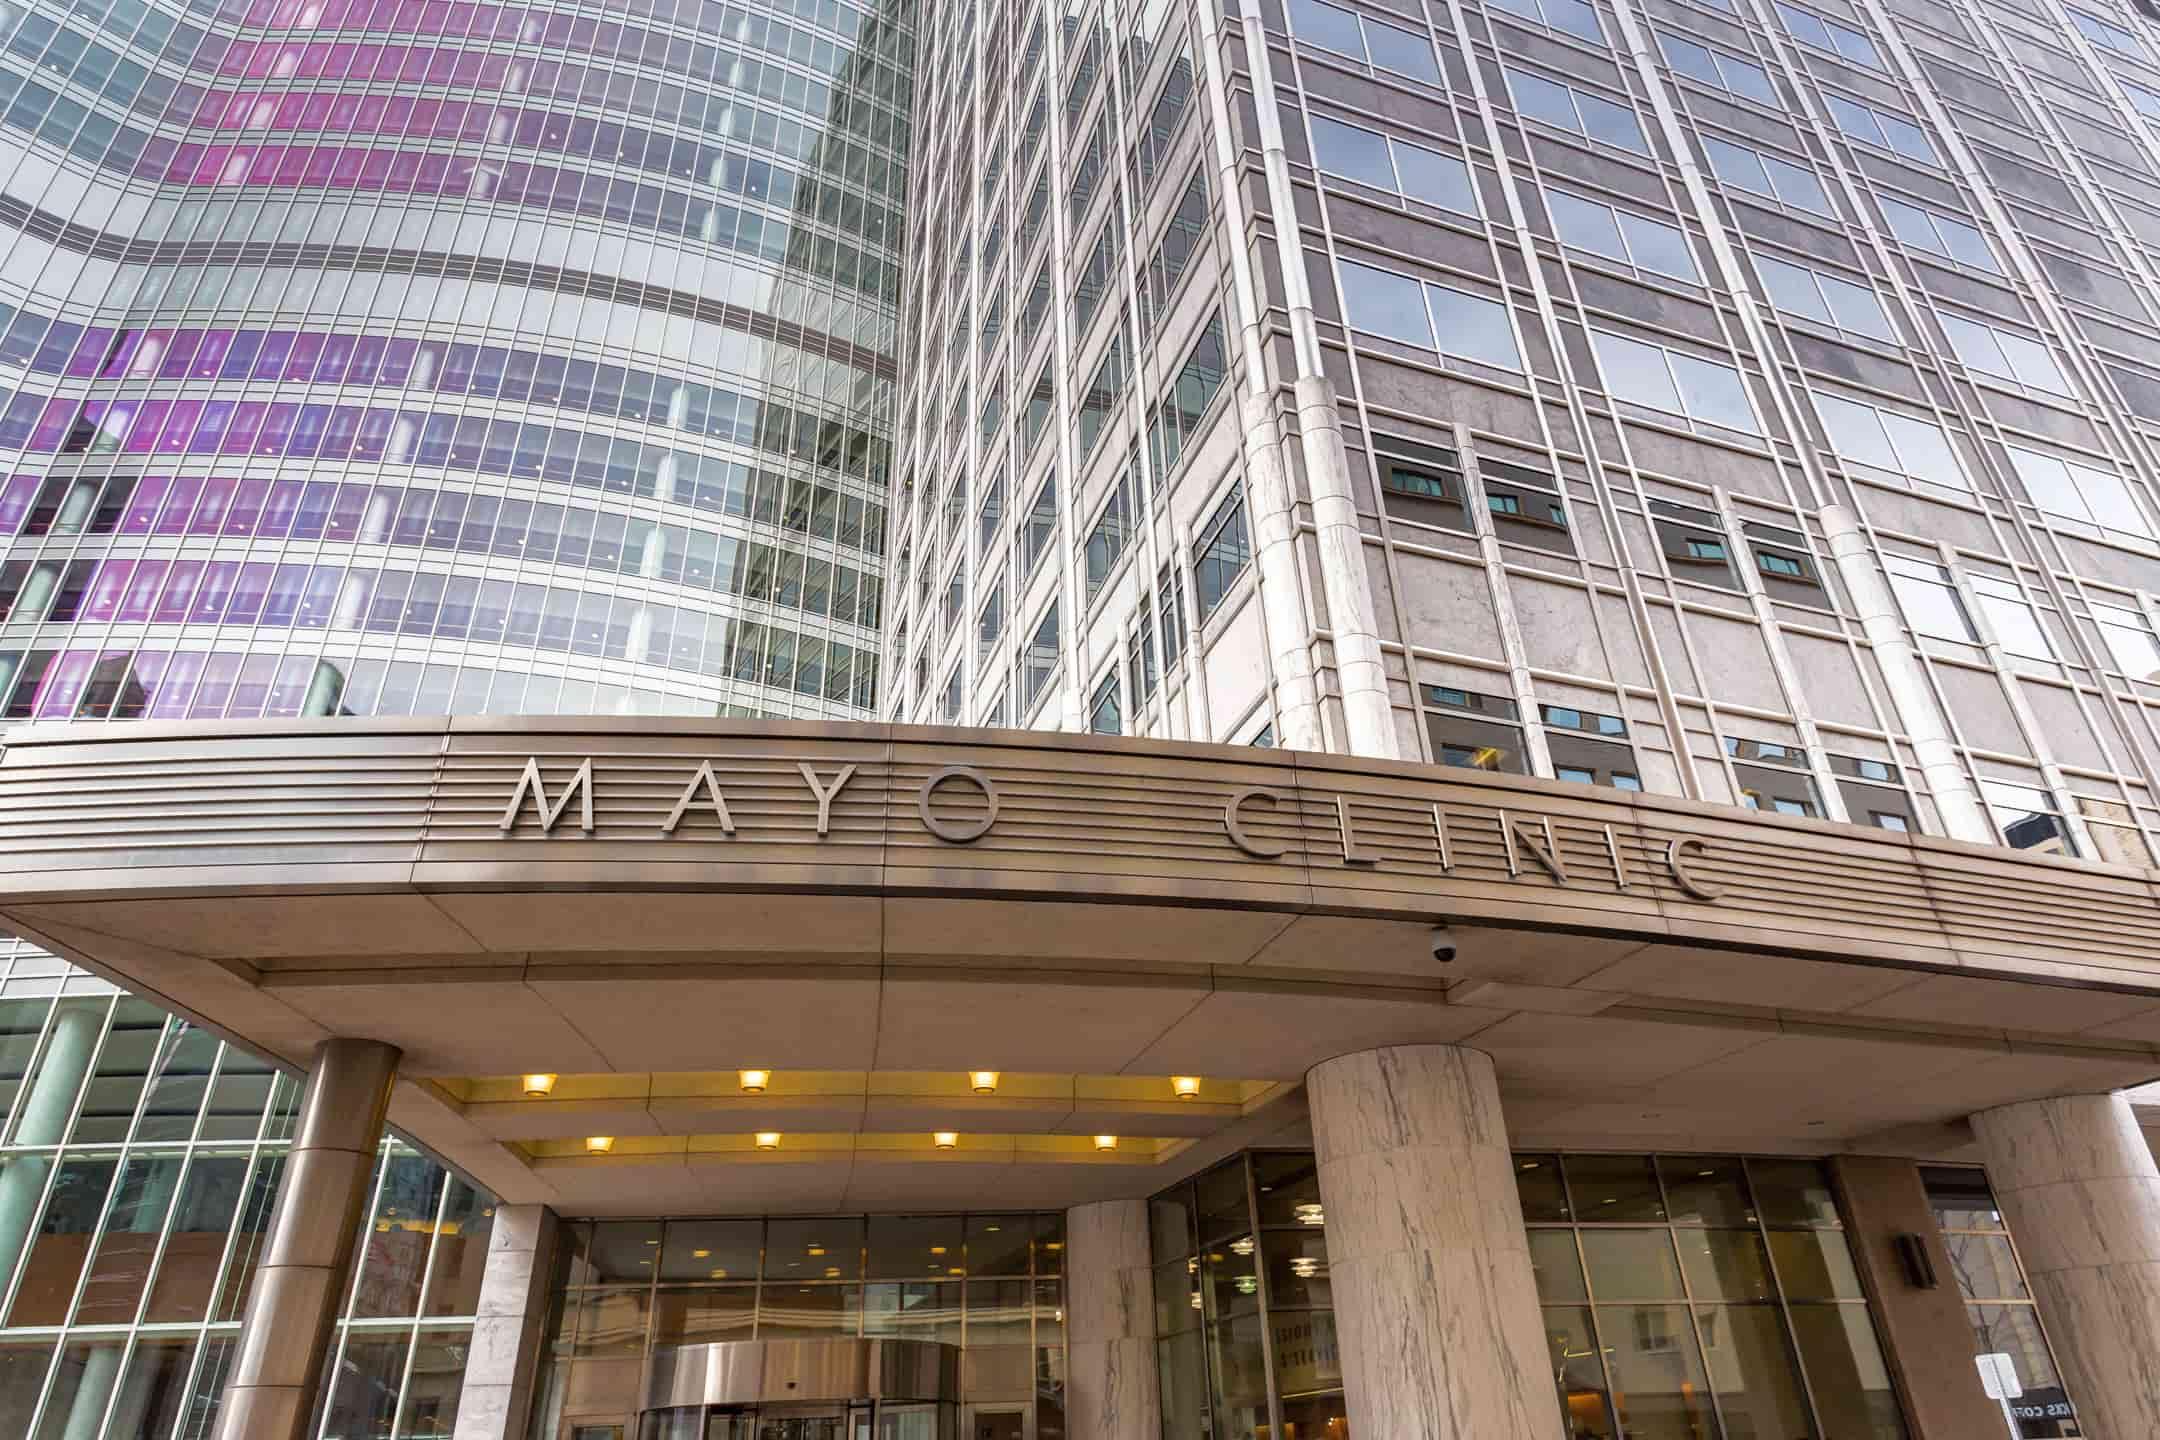 Mayo Clinic (Rochester, Minnesota)